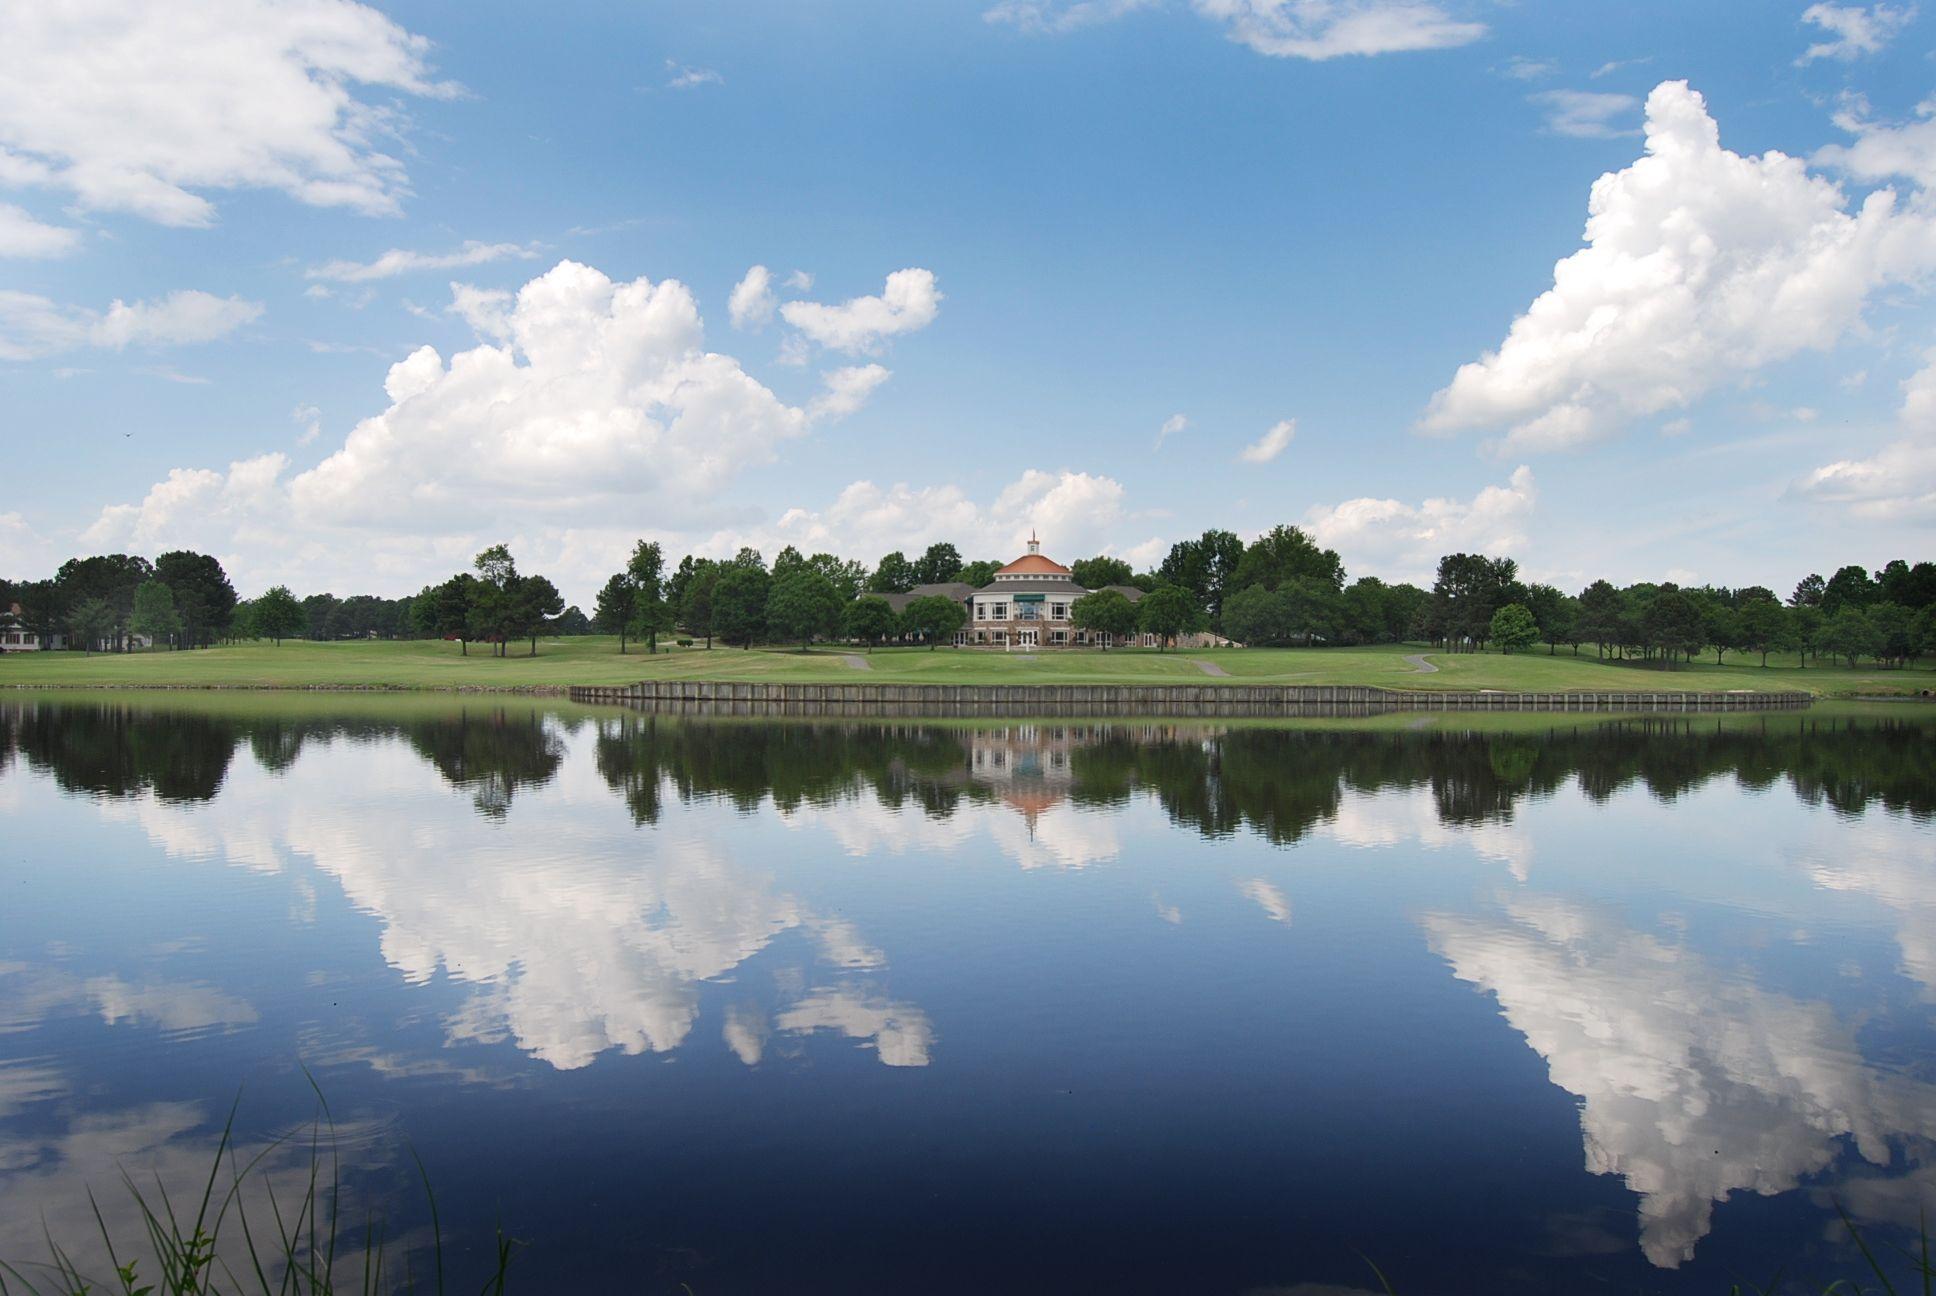 'Ellington Woods at Wyndham' by Boone Homes Inc. in Richmond-Petersburg